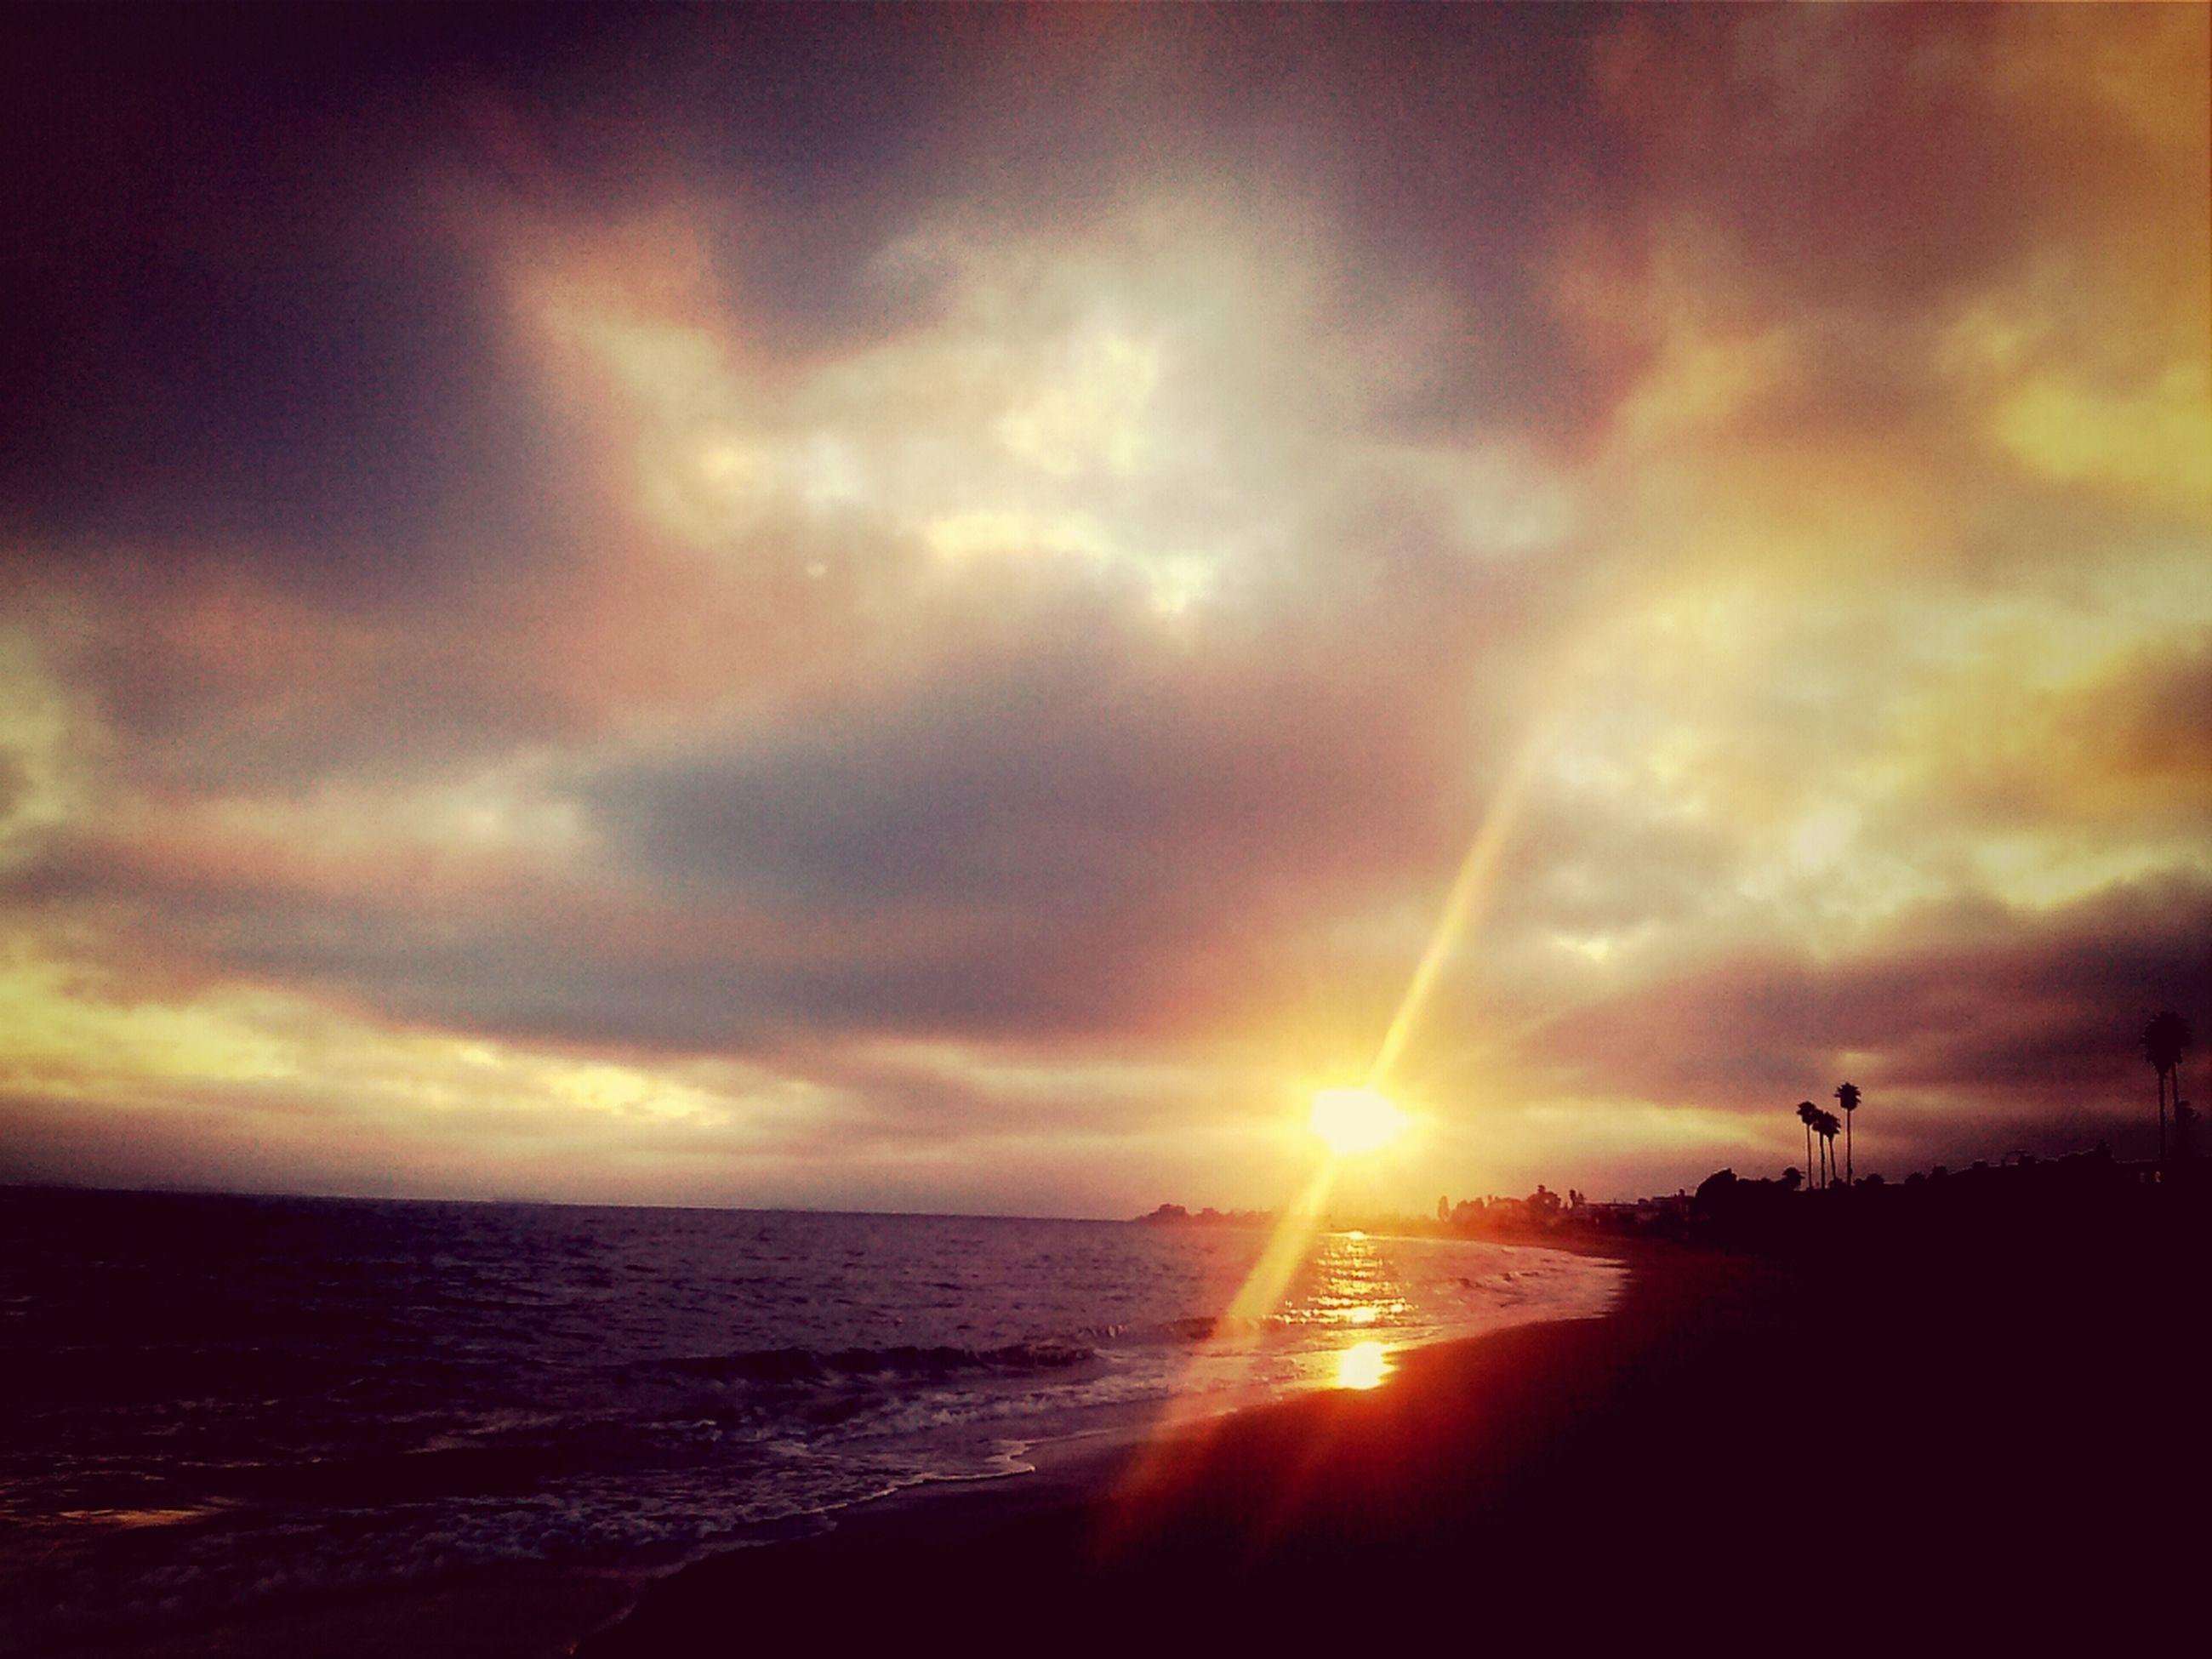 sun, sunset, sea, sky, water, scenics, sunbeam, horizon over water, beauty in nature, cloud - sky, tranquil scene, sunlight, tranquility, idyllic, lens flare, beach, nature, orange color, cloudy, cloud